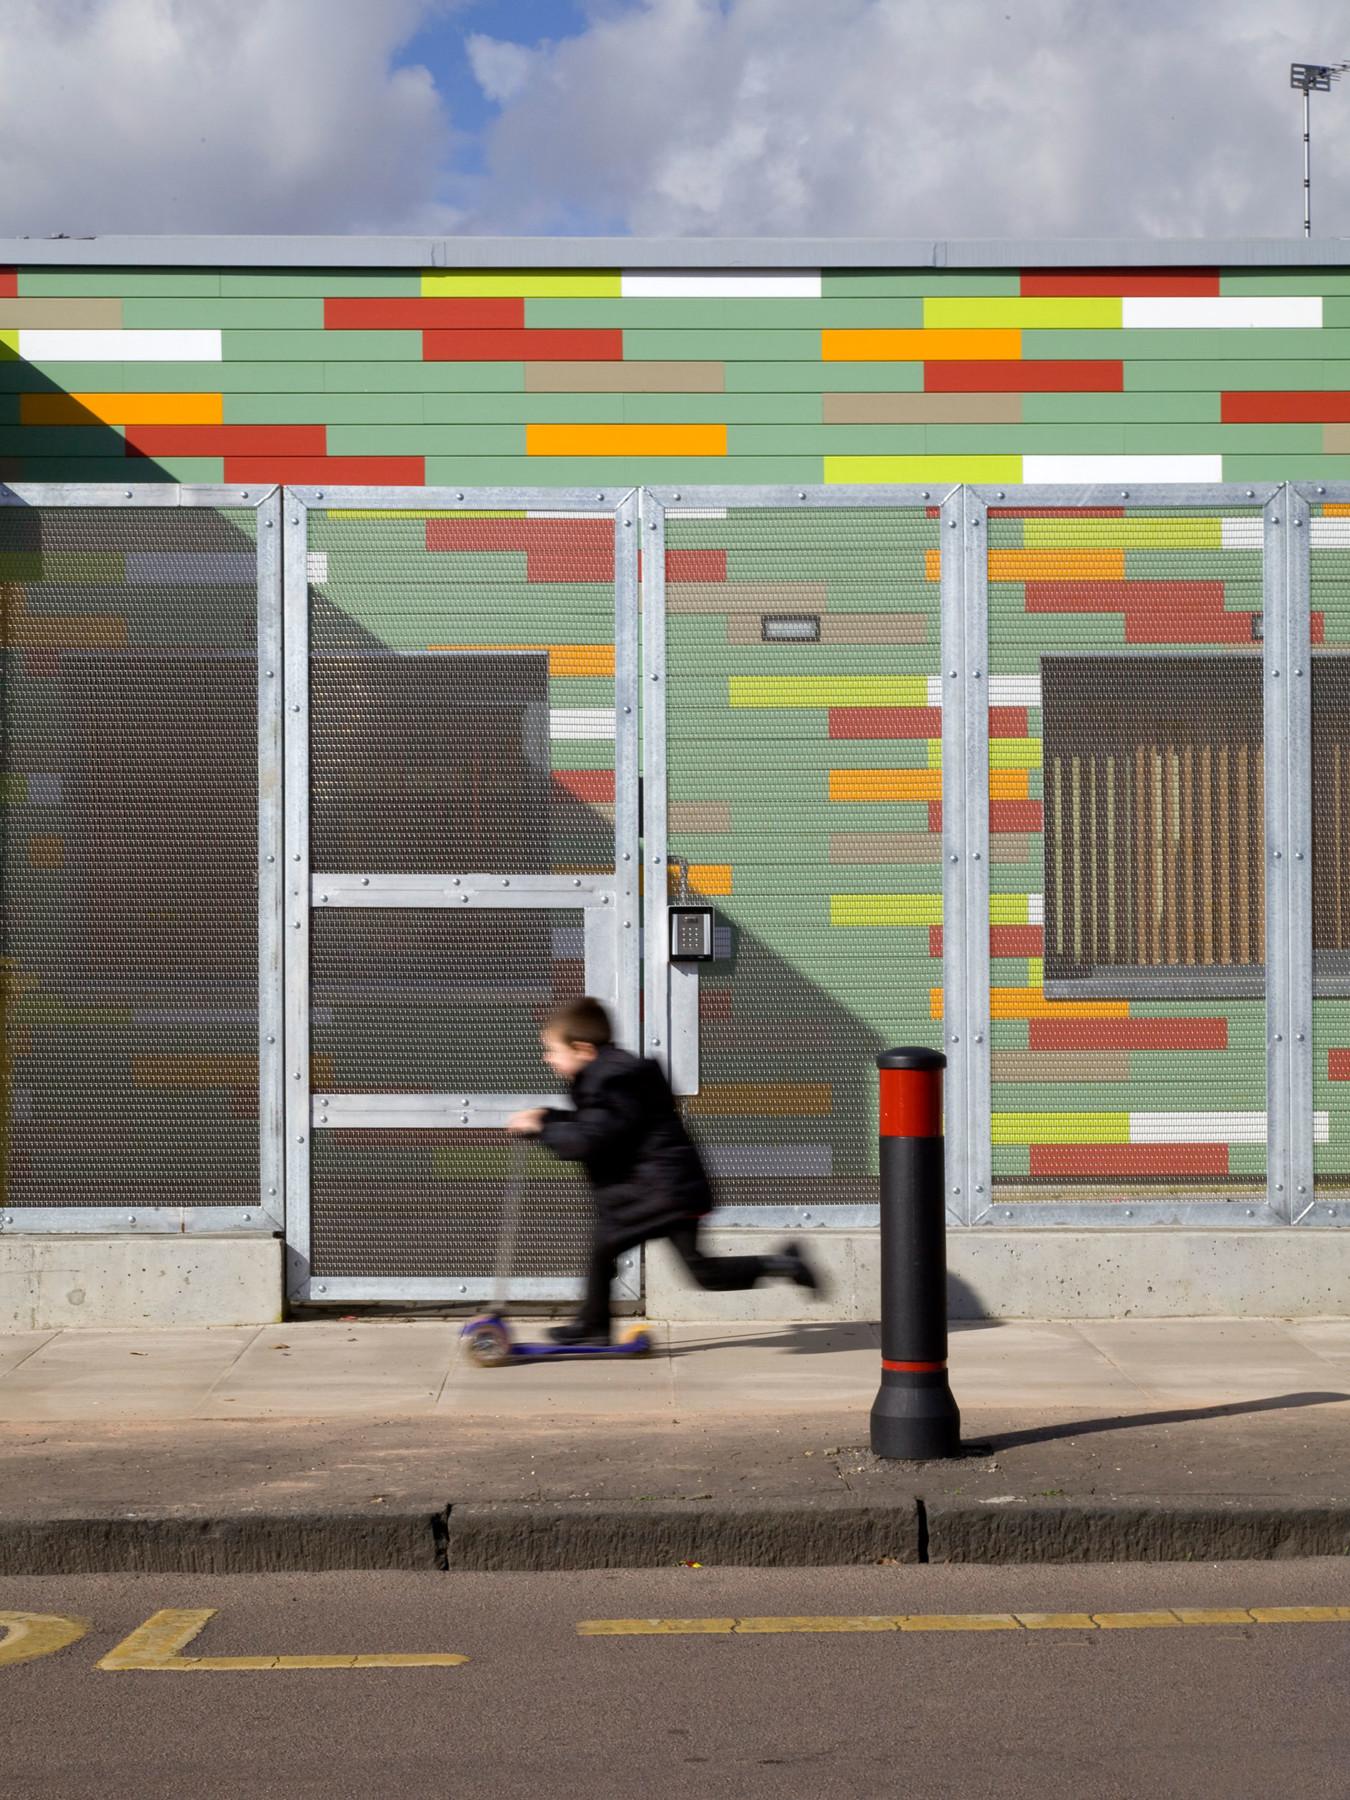 Sarah-Wigglesworth-Architects Heathfield External Boy Scooter 1800